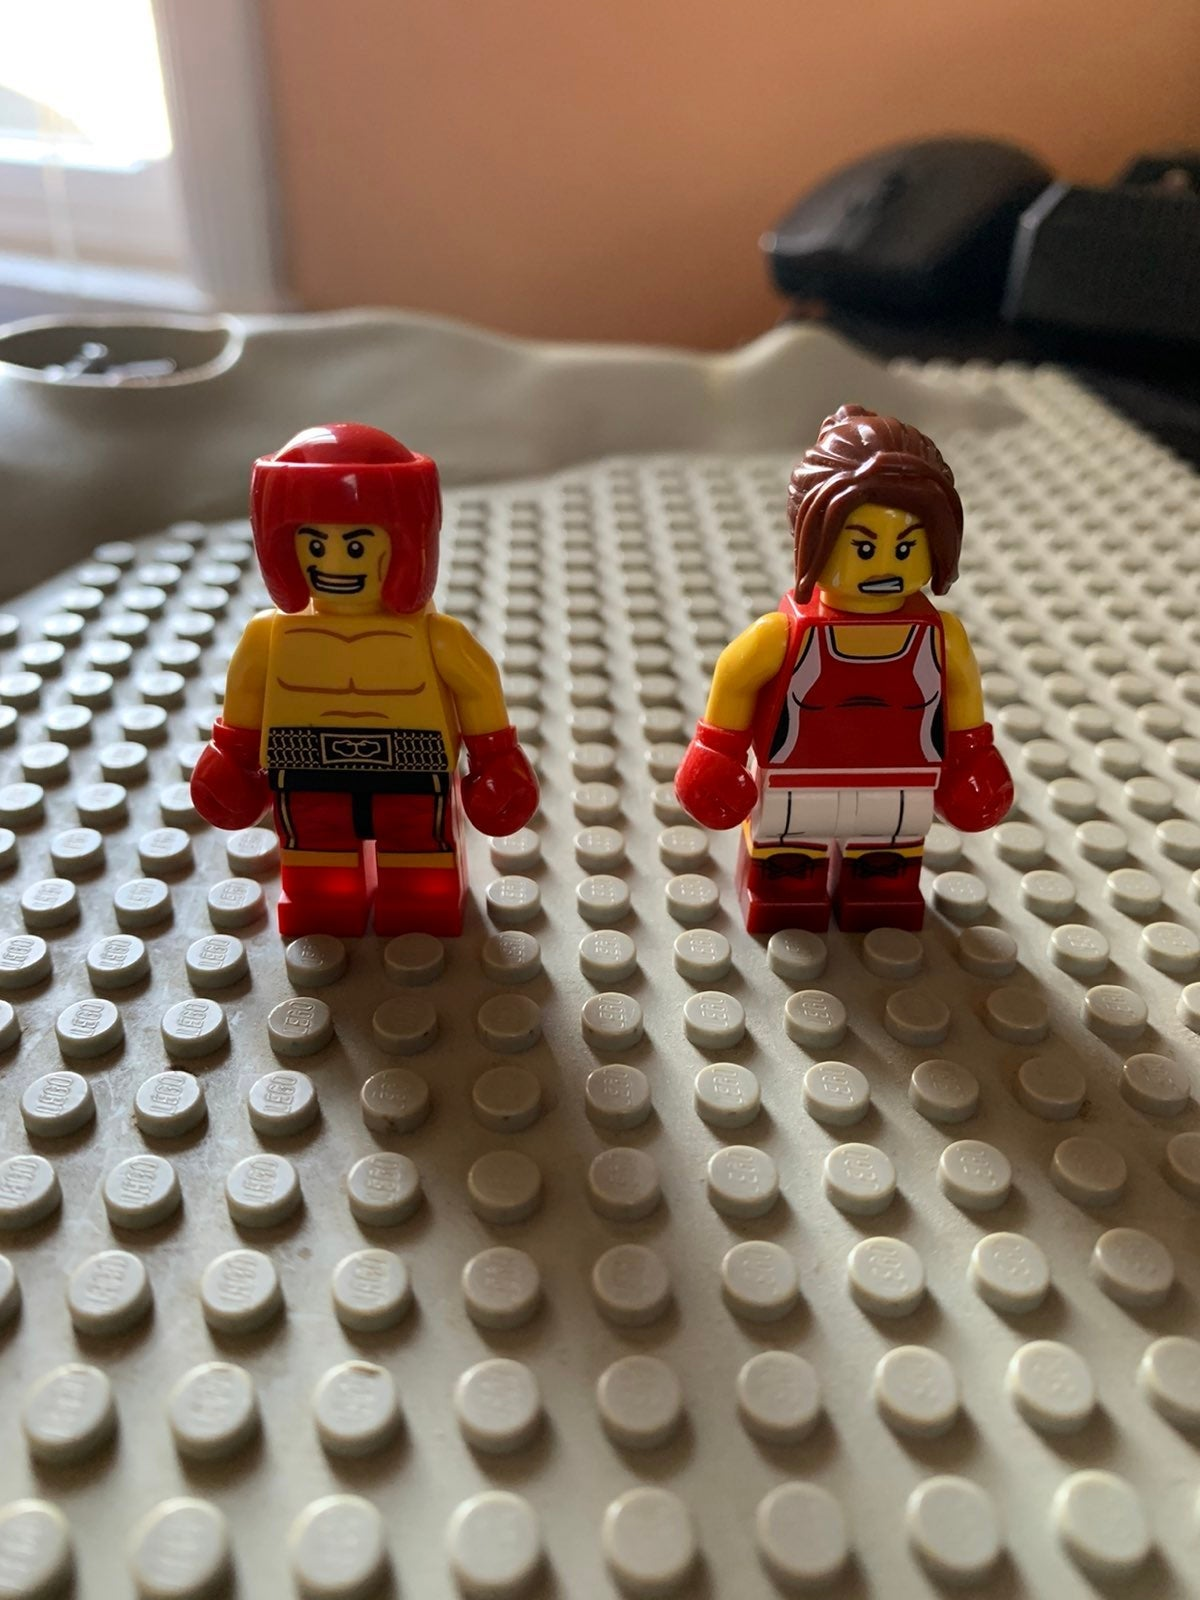 Lego boxing minifigures